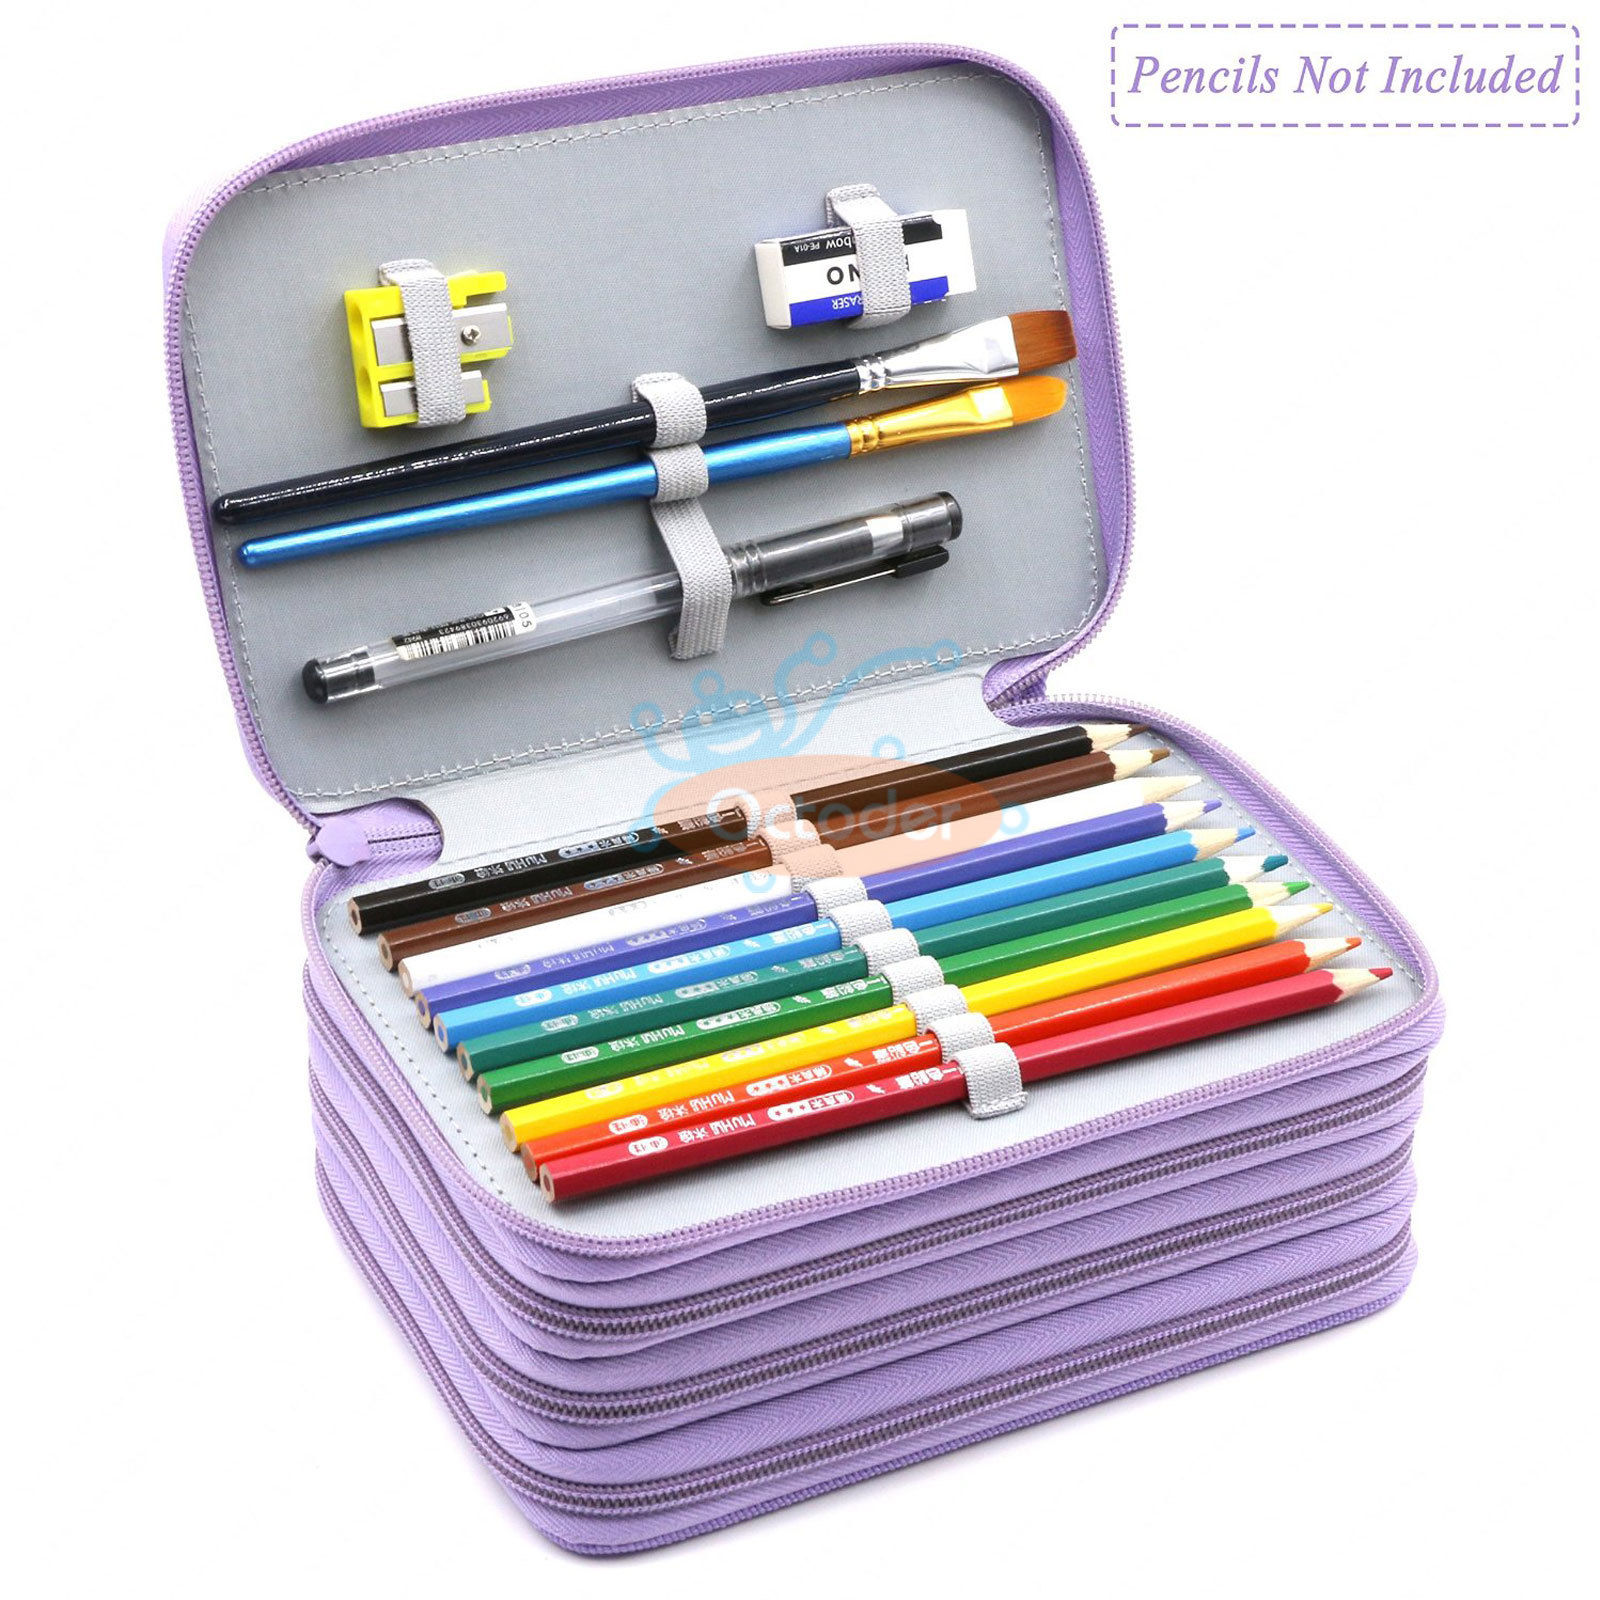 4-Layers-High-Capacity-Pencil-Brush-Case-Box-Pen-Pouch-Bag-Makeup-Storage-Bag thumbnail 25